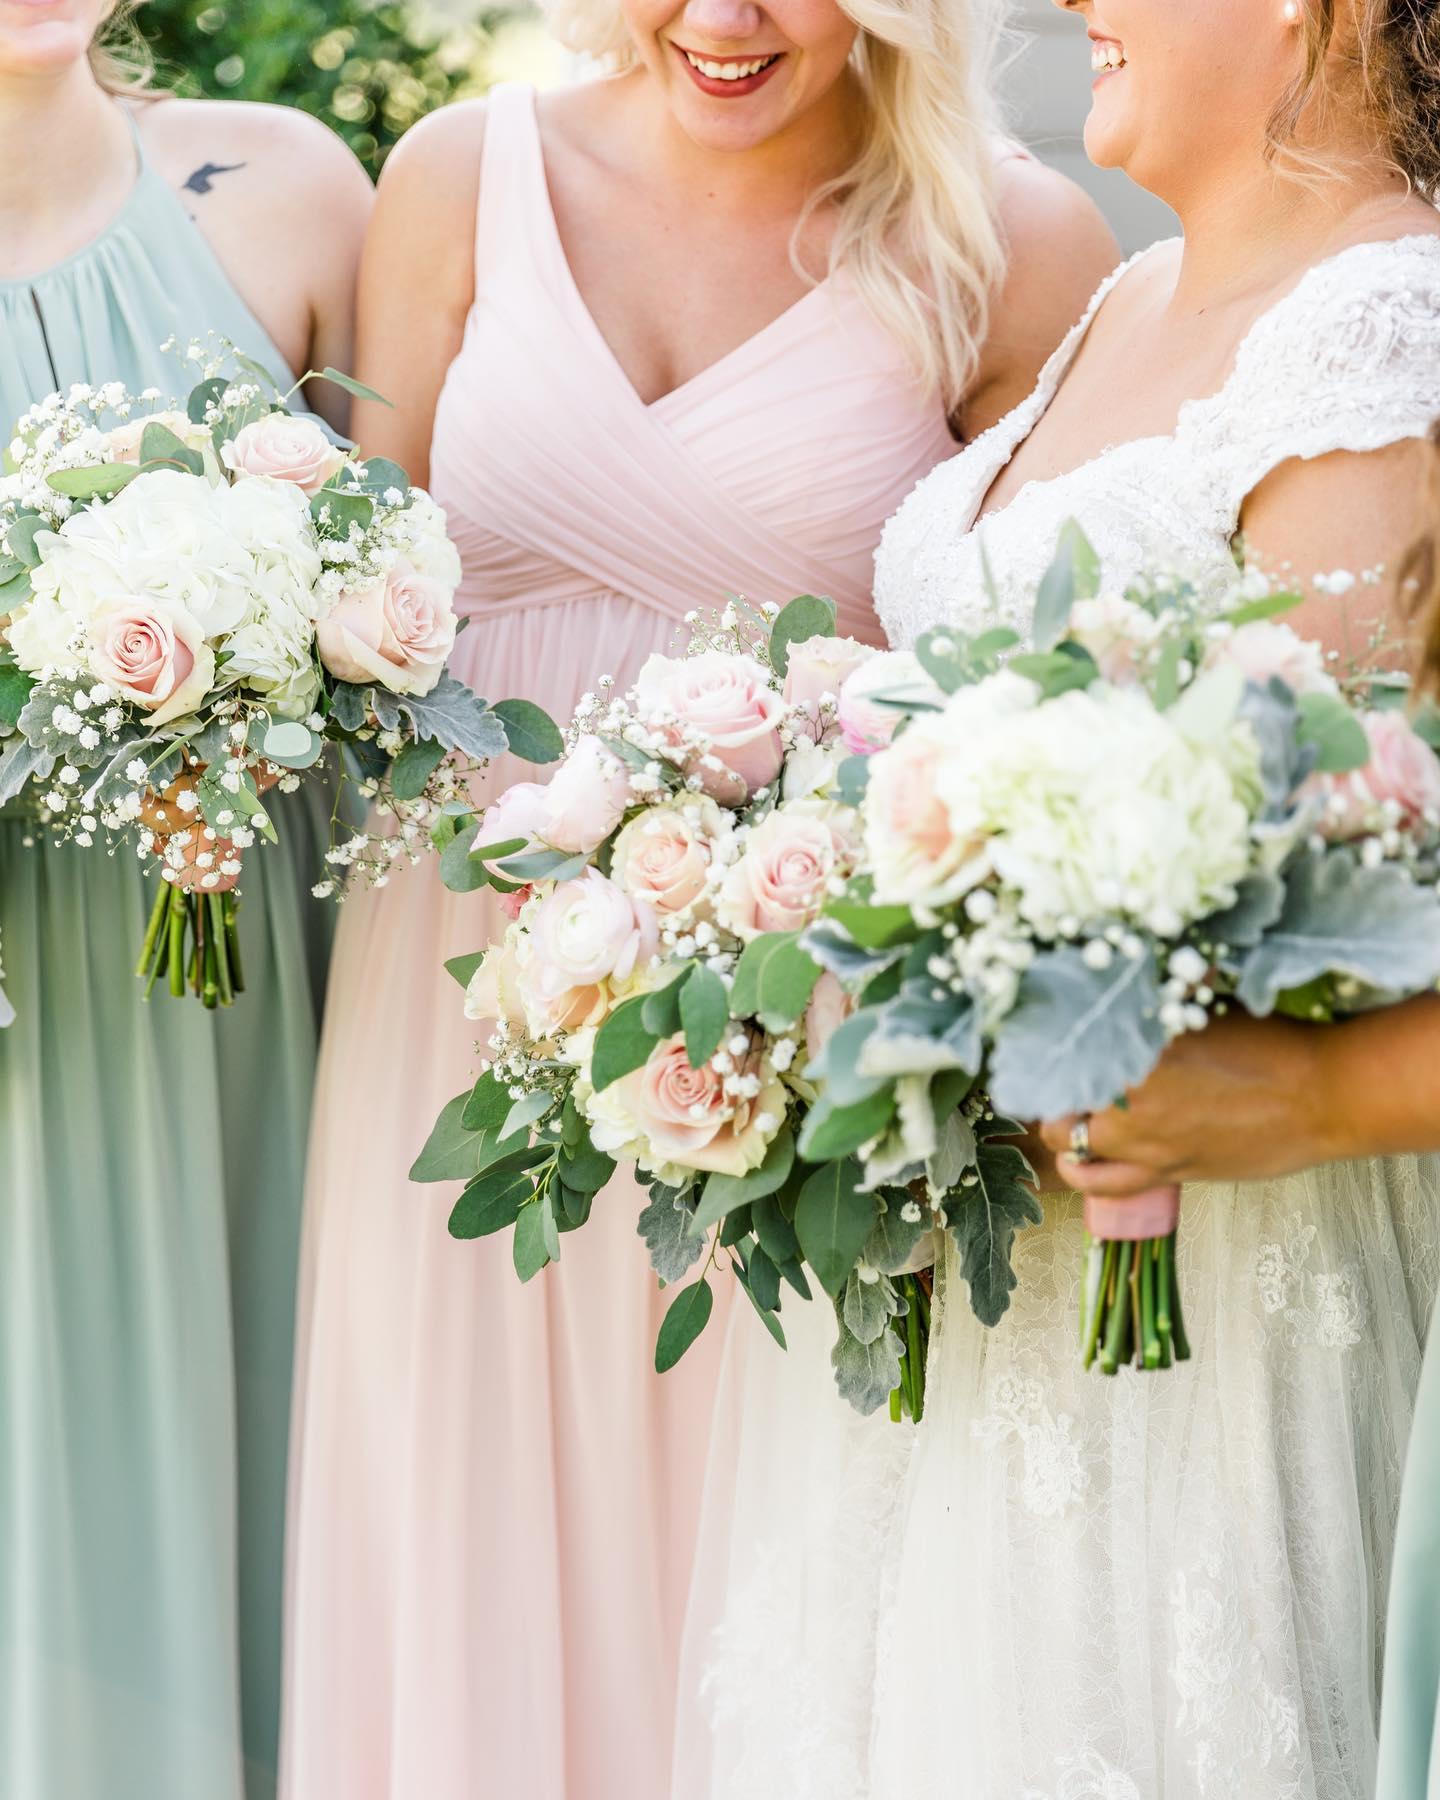 bridesmaids in spring wedding colors